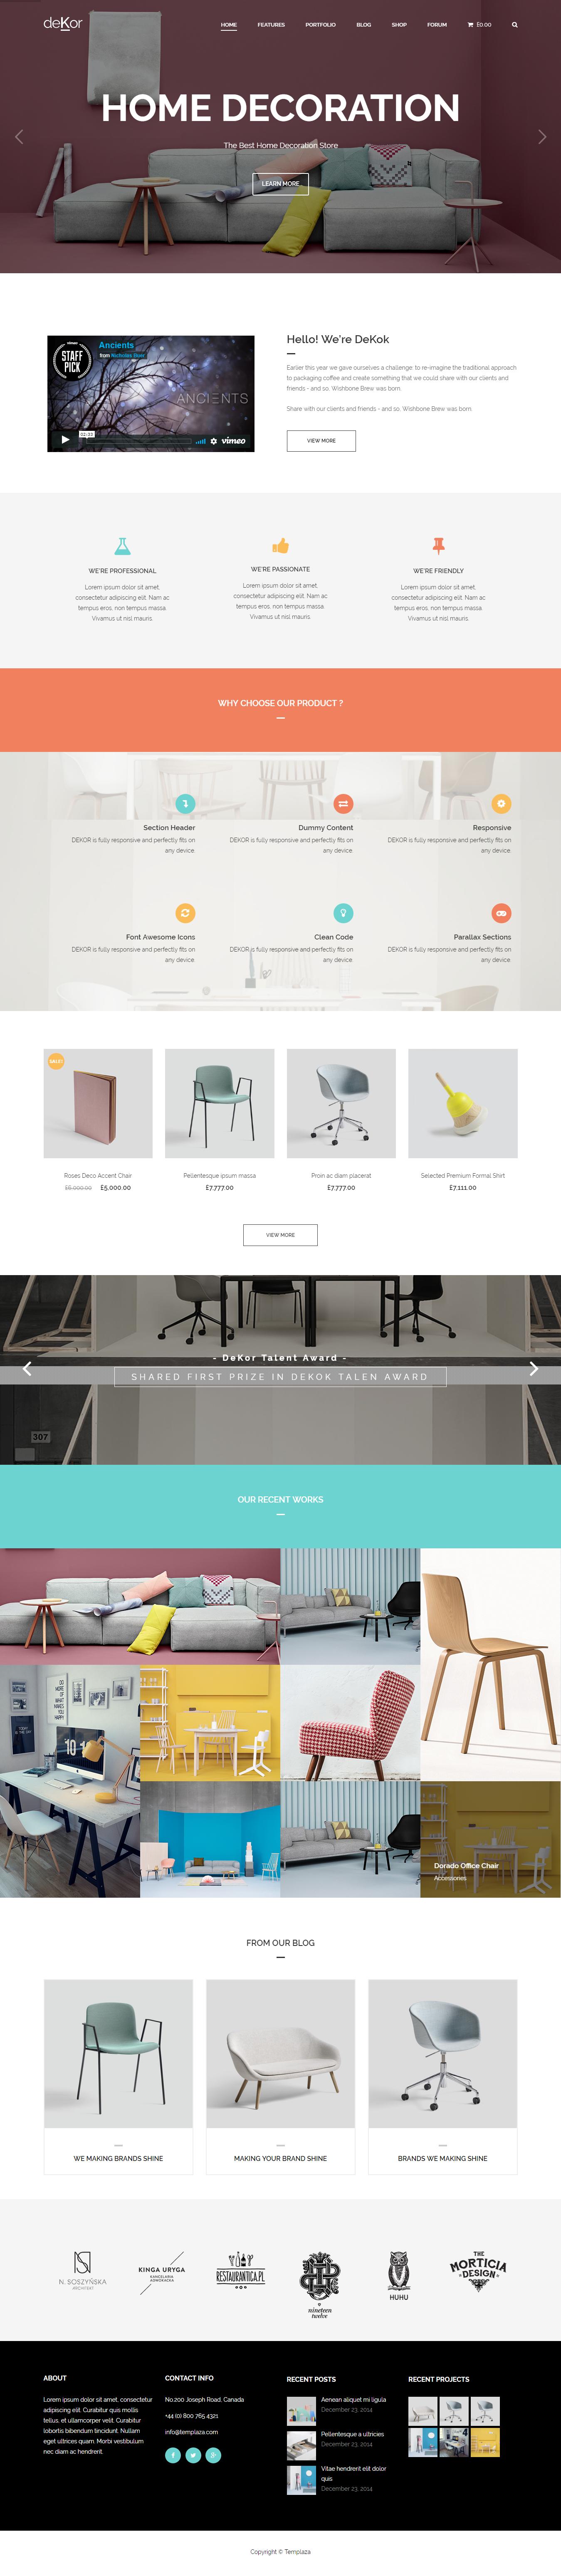 deKor - Mejor tema de WordPress de diseño de interiores premium